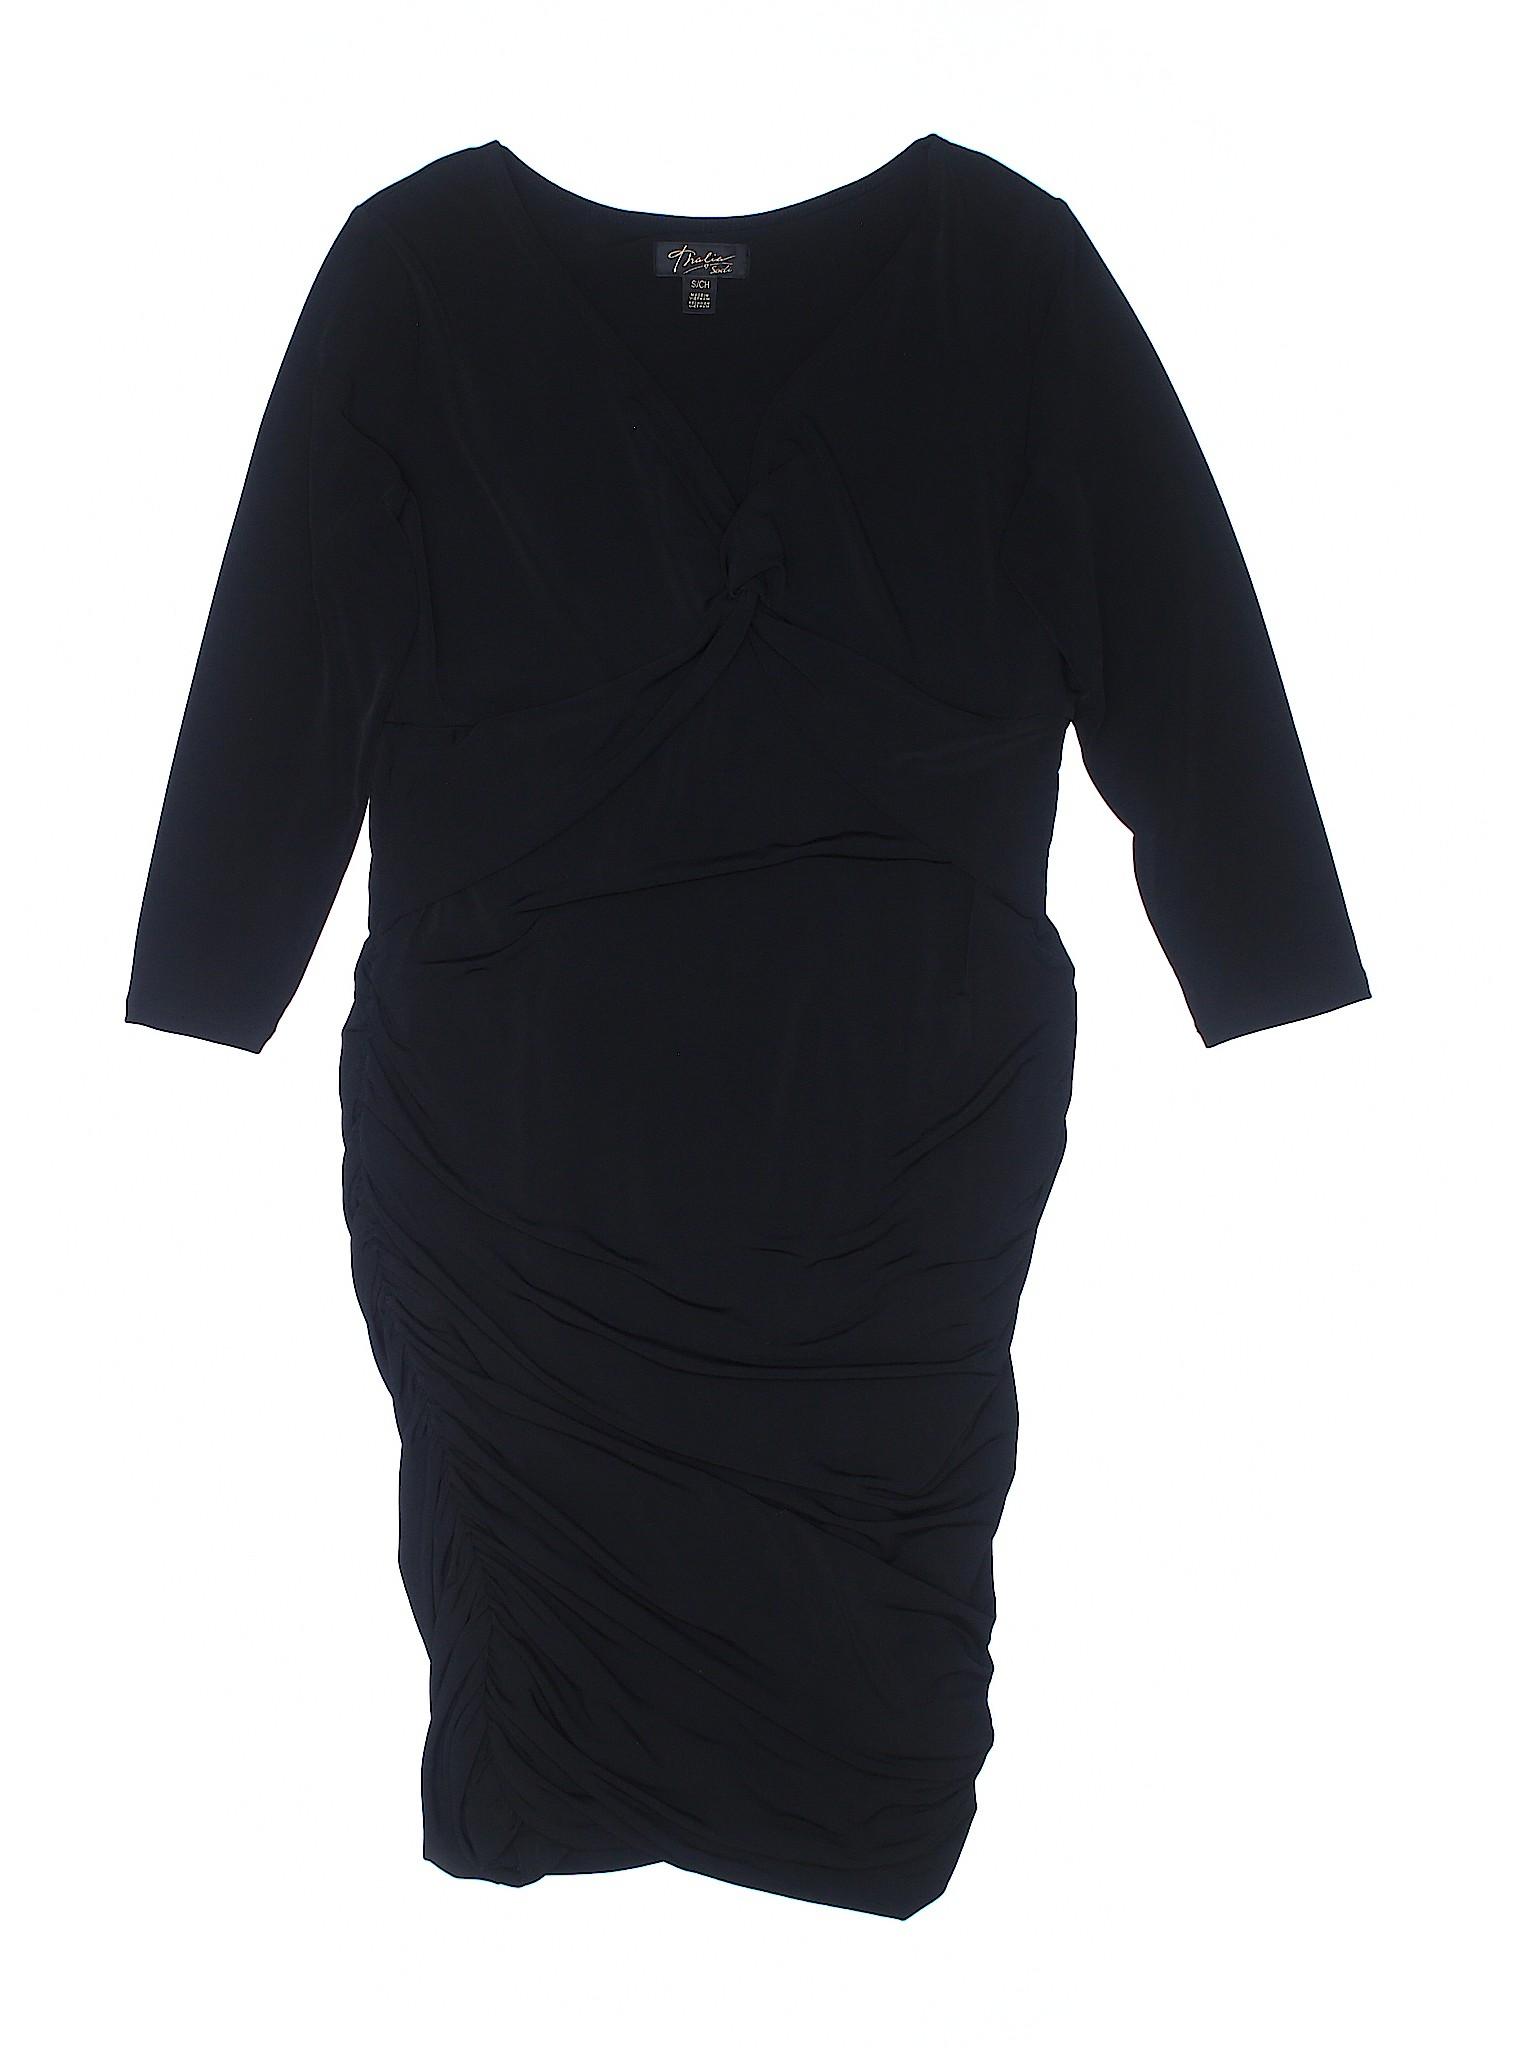 Selling Thalia Thalia Sodi Casual Sodi Selling Dress Casual Dress EWqz7x71n